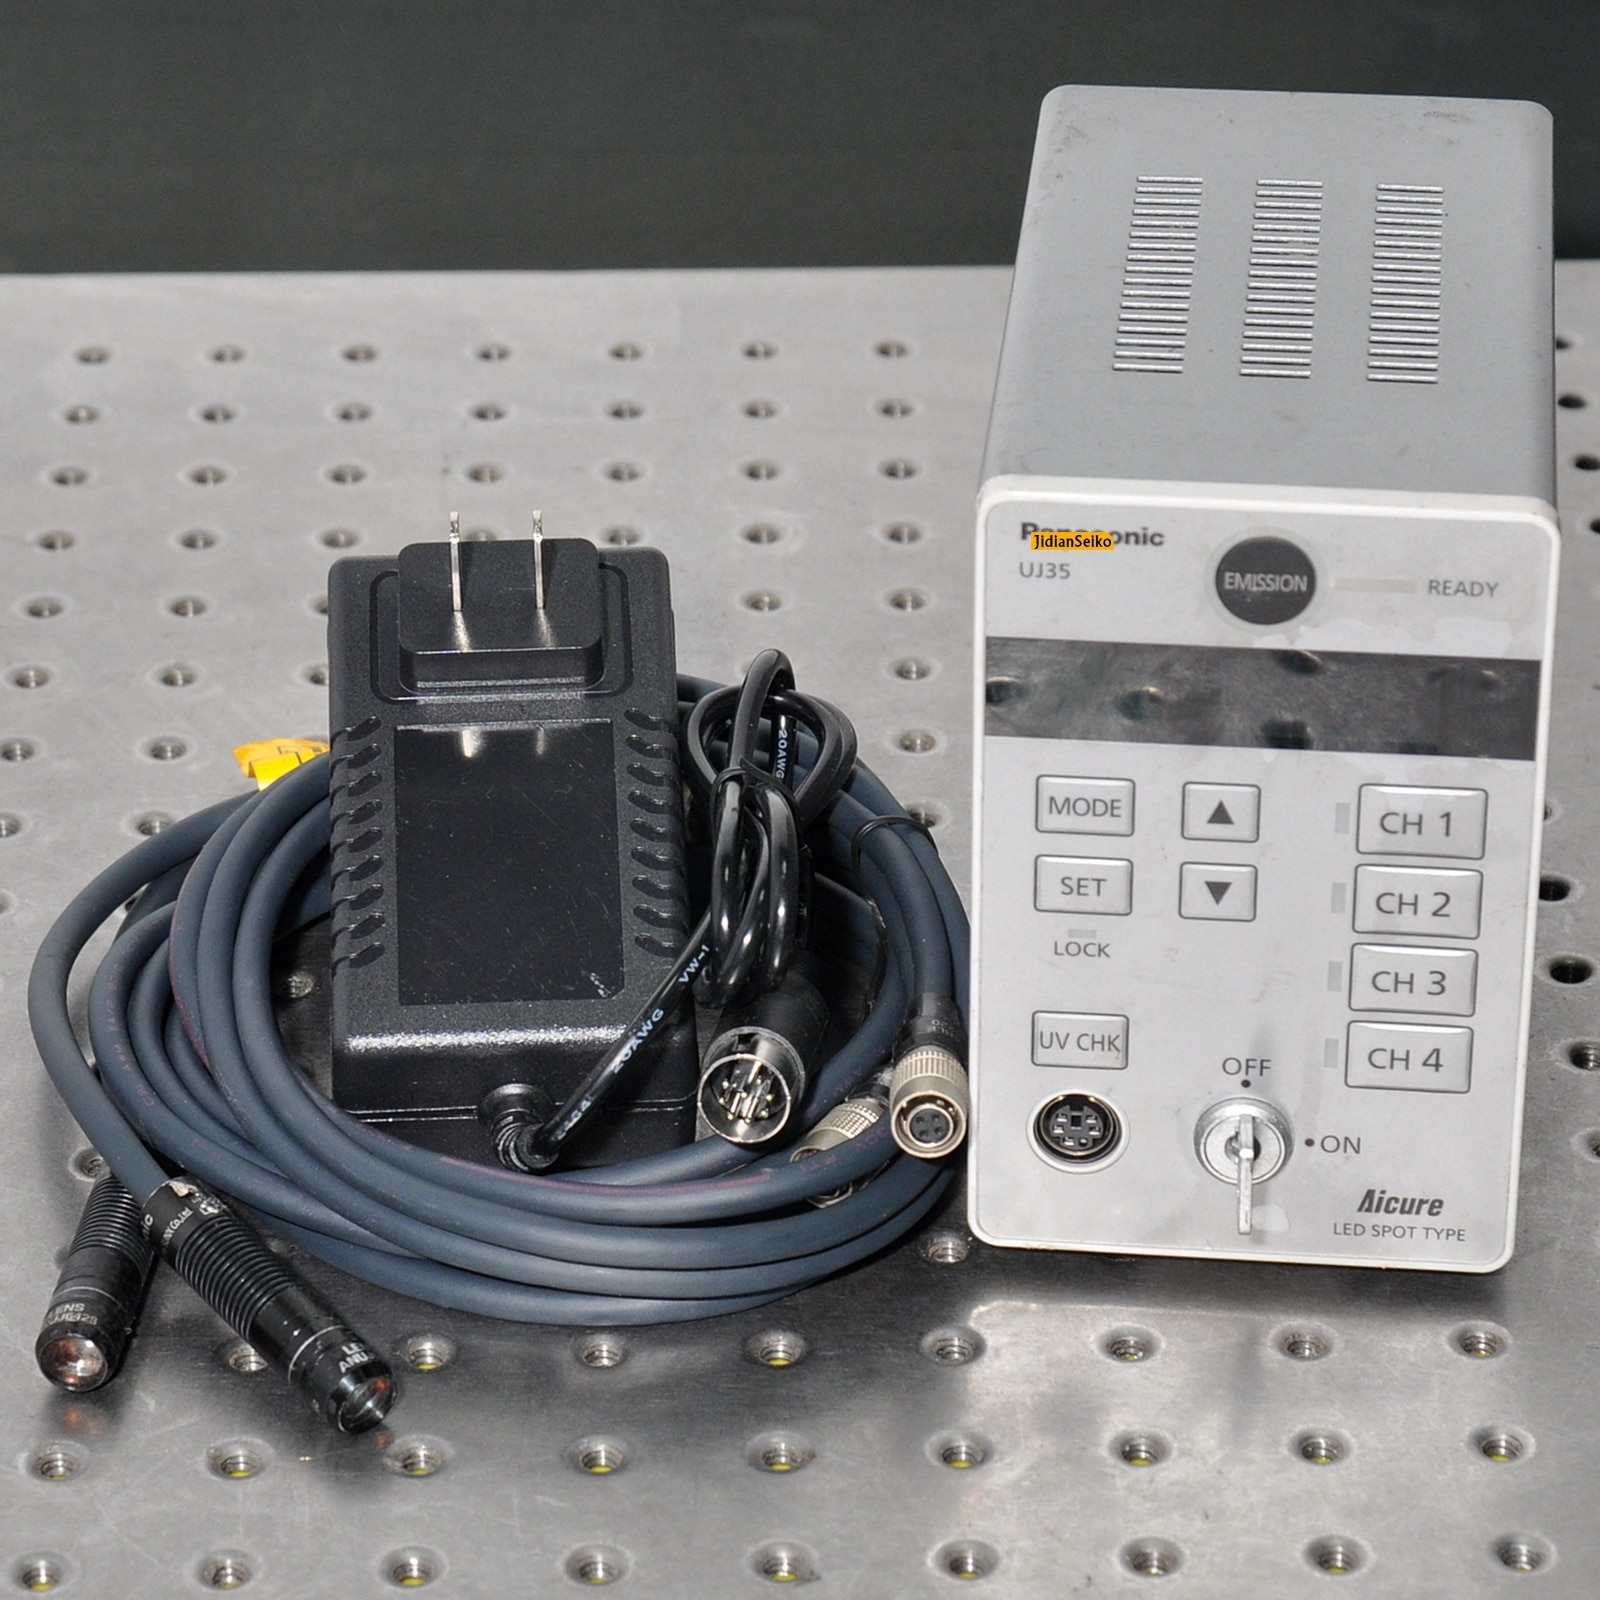 UJ35 UV LED curing machine LED point light source machine with 2 4 irradiation heads ANUJ6017